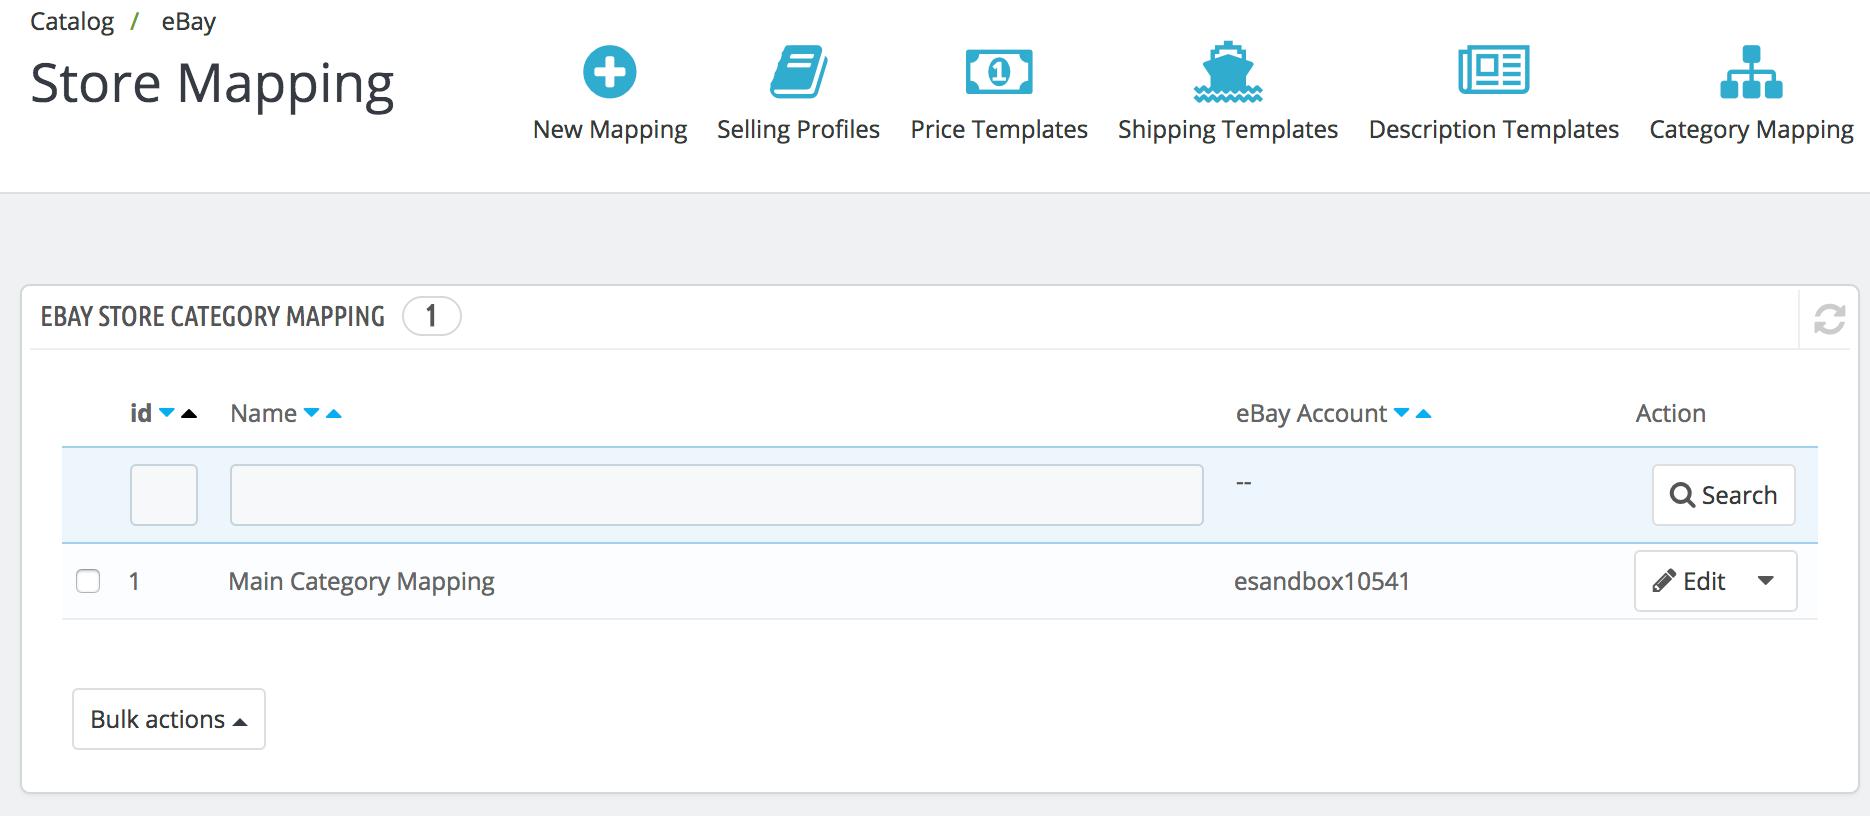 PrestaShop ebay module — eBay Store Mapping